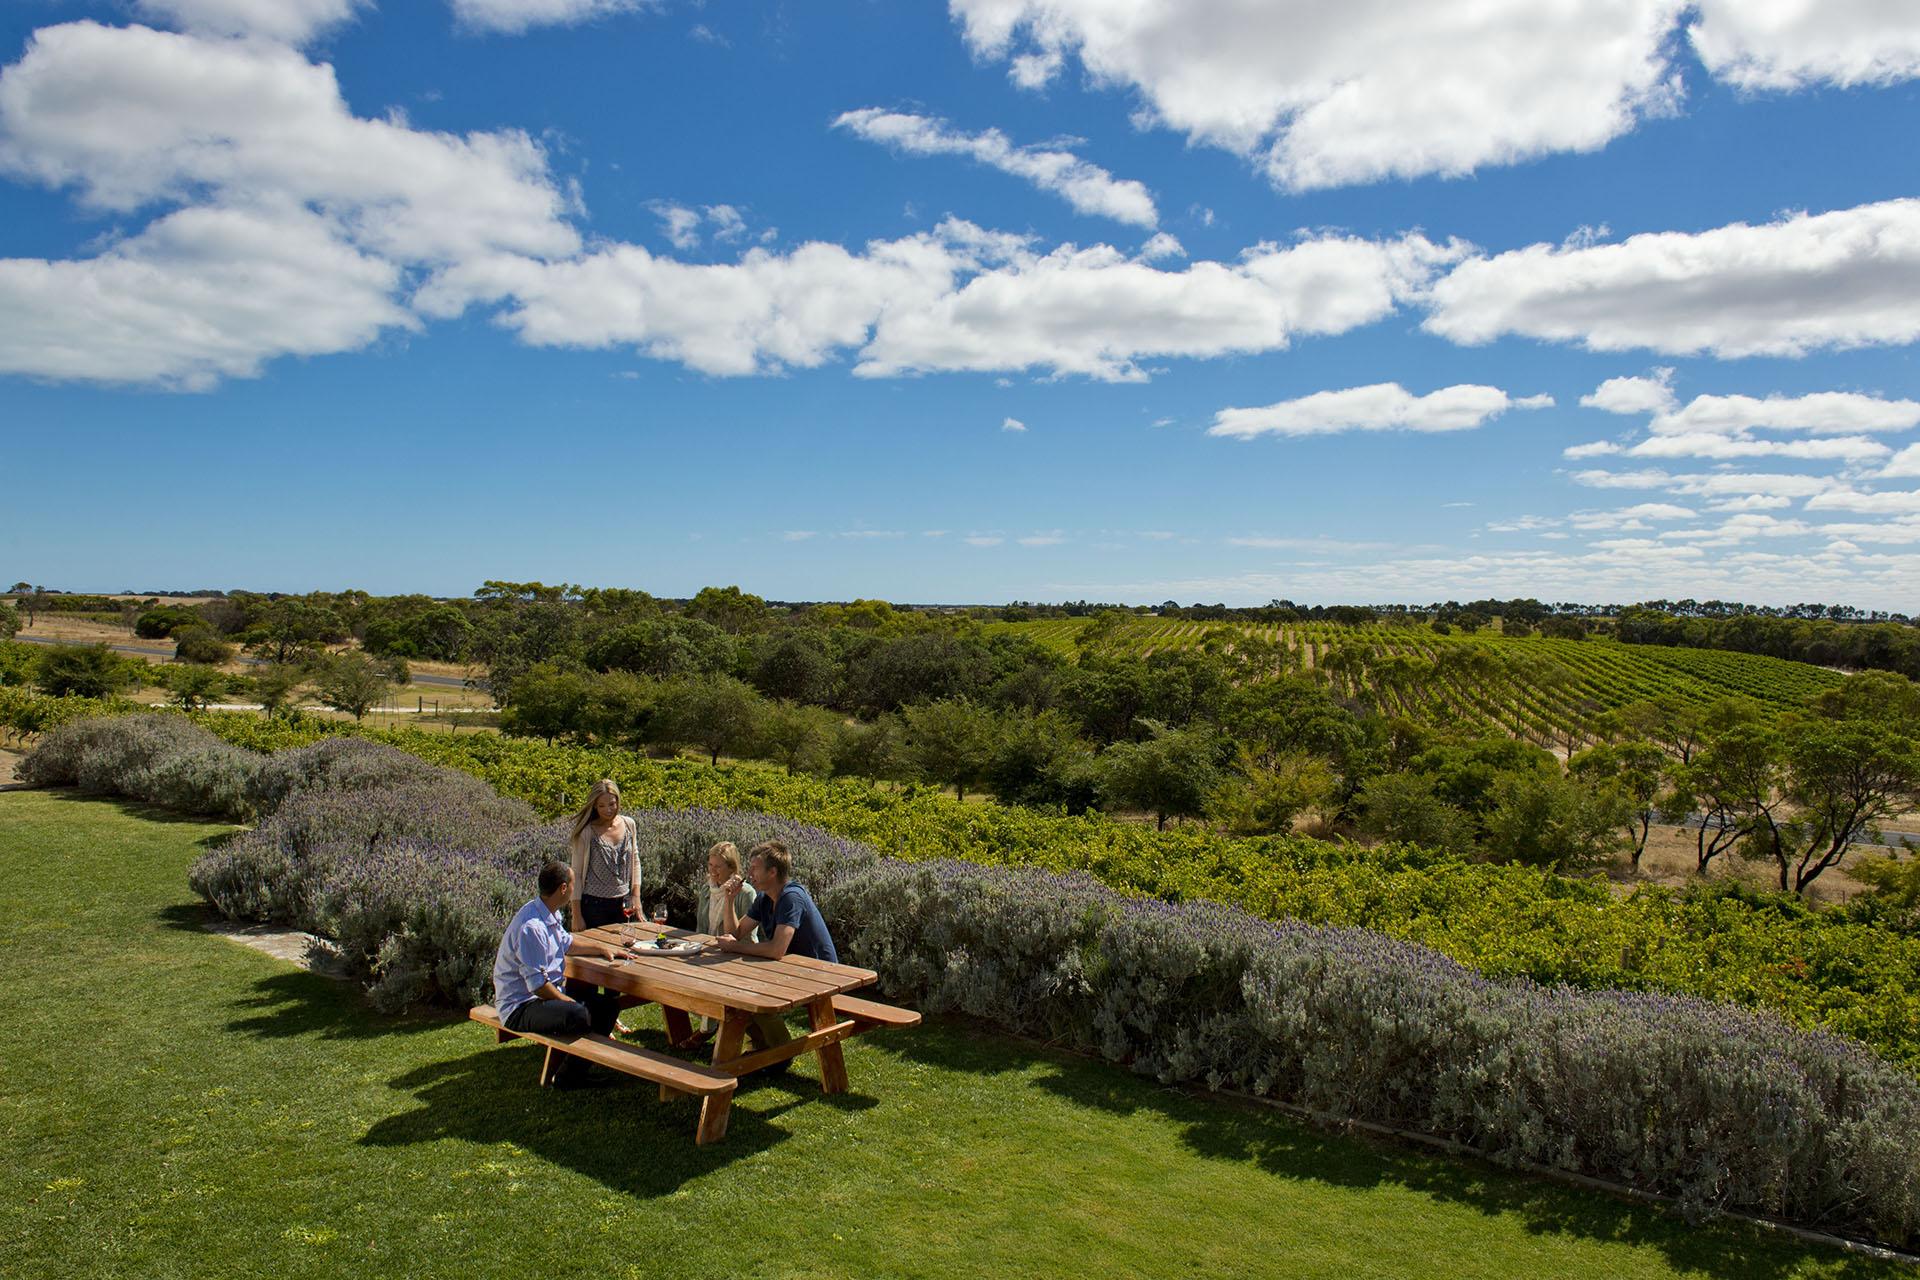 Mount Benson wine region of South Australia